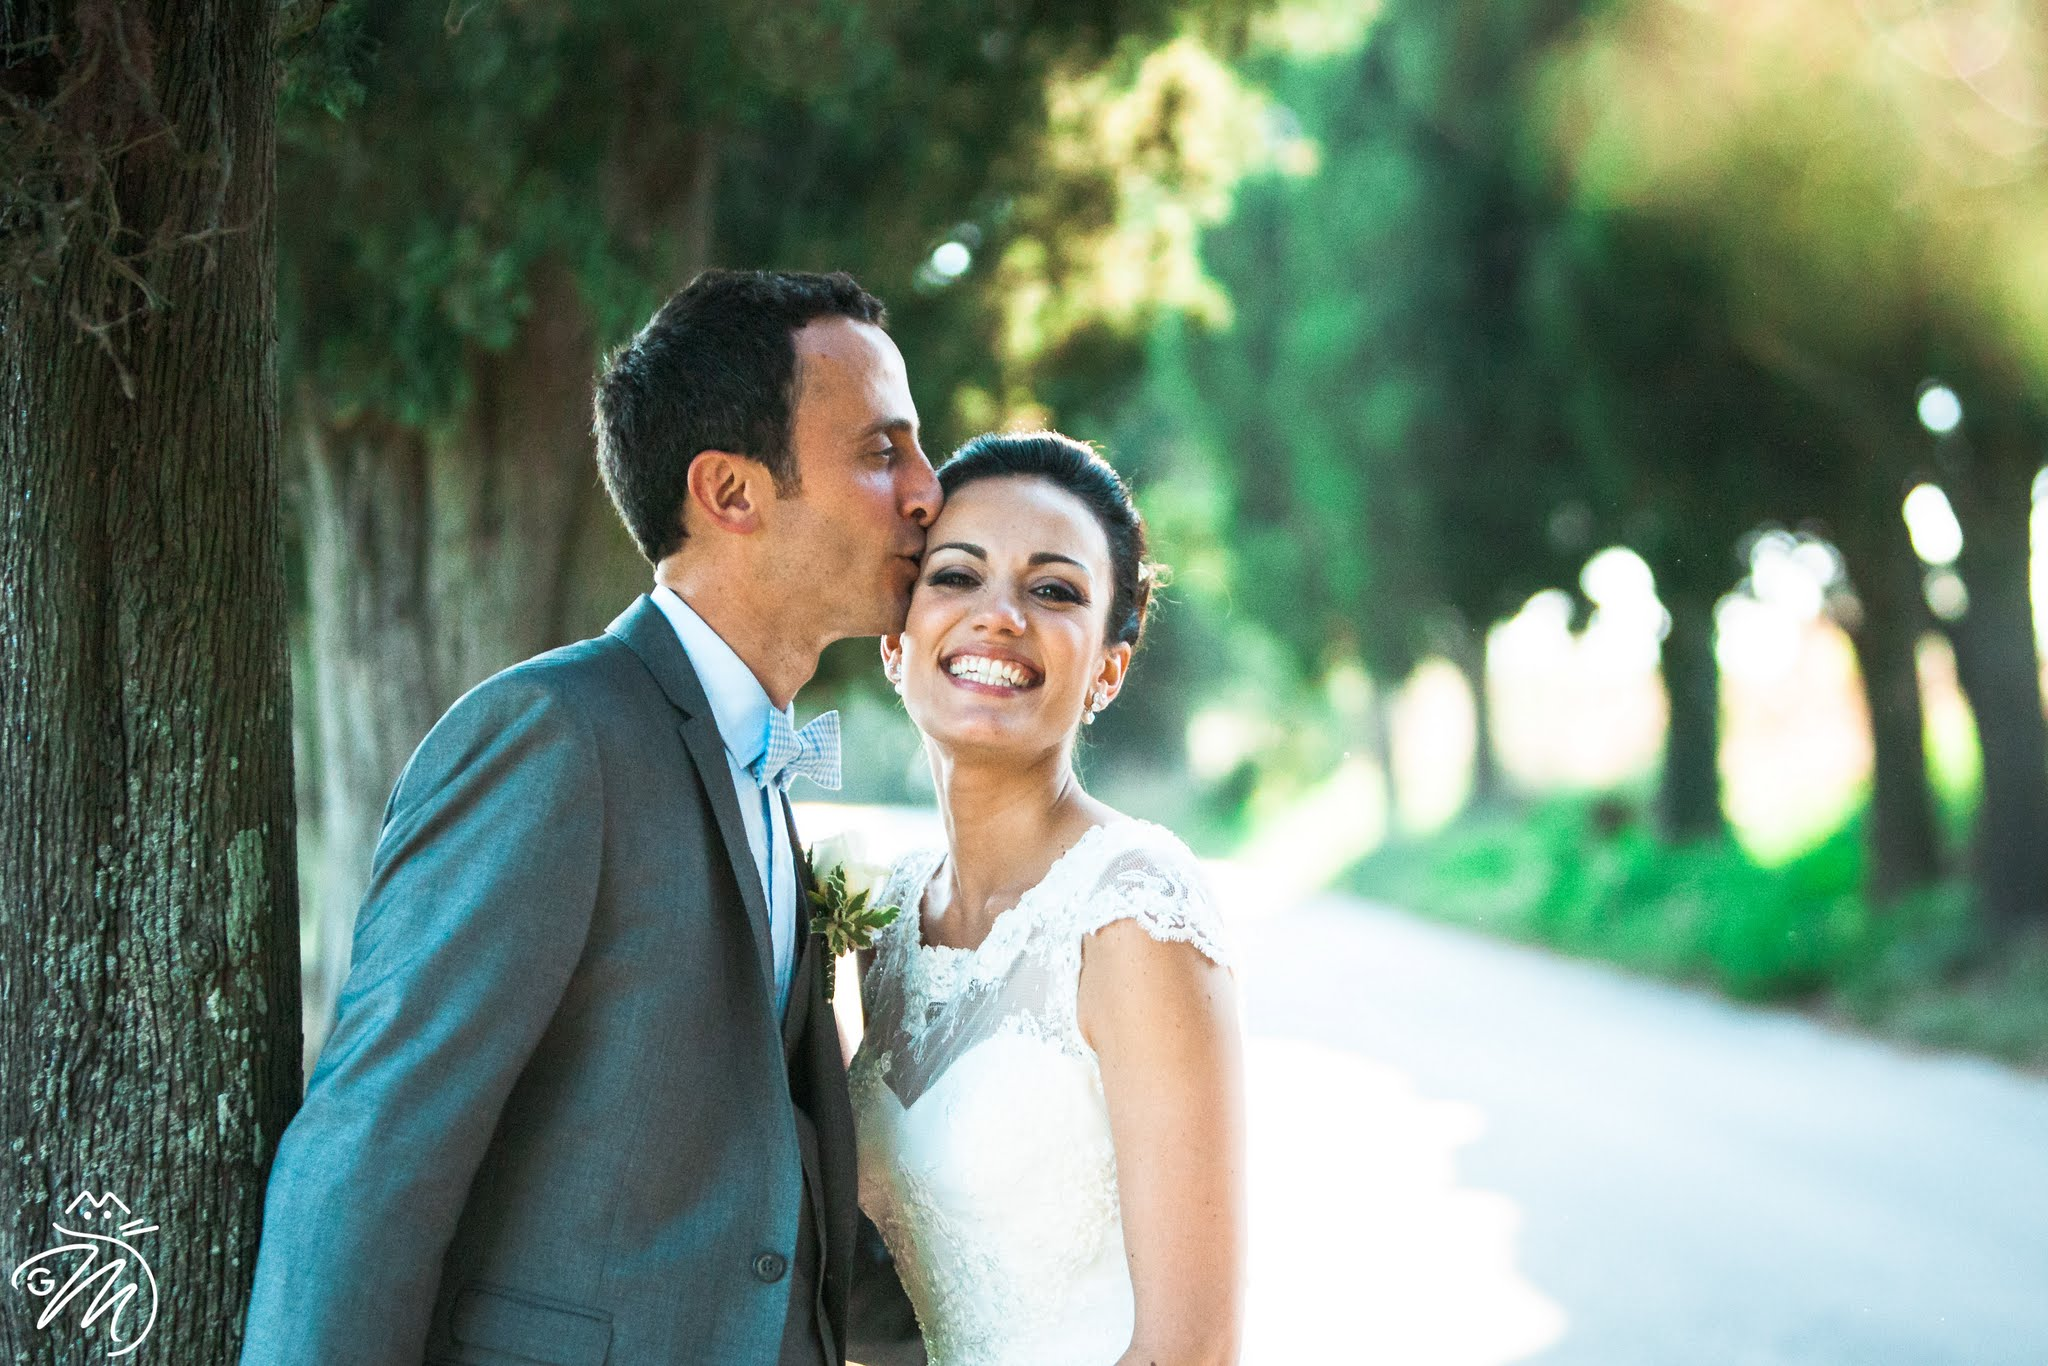 fotografo matrimonio Roma photographer in Italy ORIZZONTALI2_LOGO_HOME_PAGE_INTERNATIONAL_PHOTOGRAPHER_IN_ROME_WEDDING_DESTINATION_GIROLAMO_MONTELEONE_-4